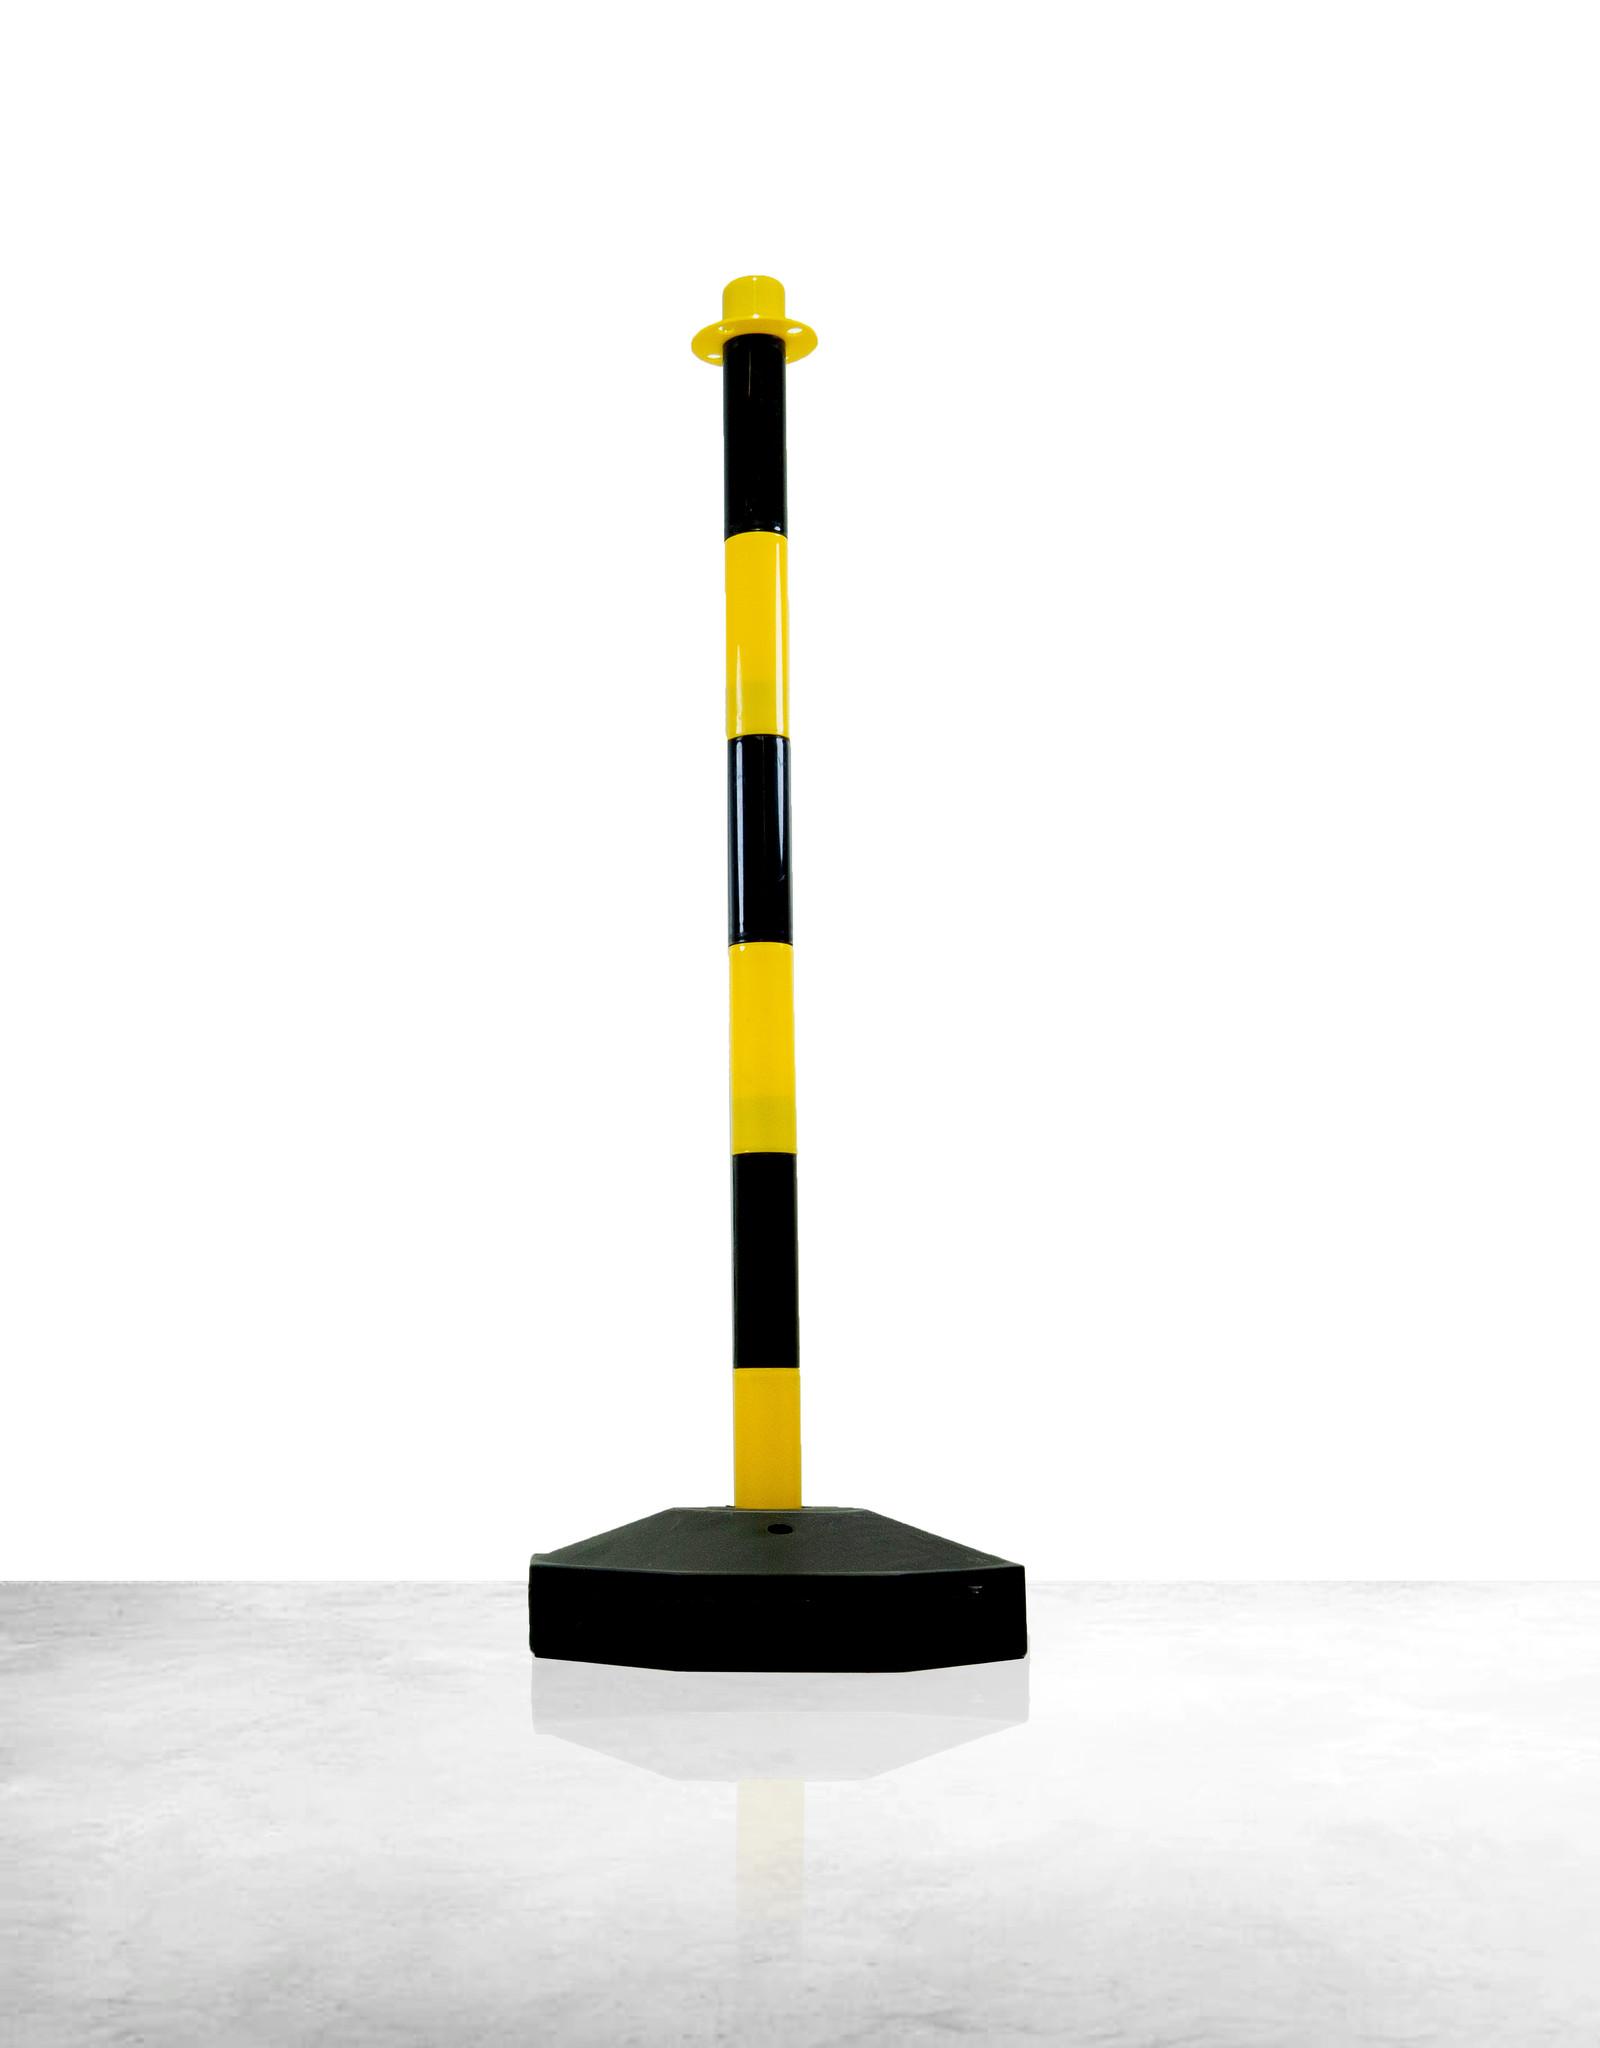 Ri-Traffic | Afzet Kettingpaal Zwart Geel met op te vullen Voet